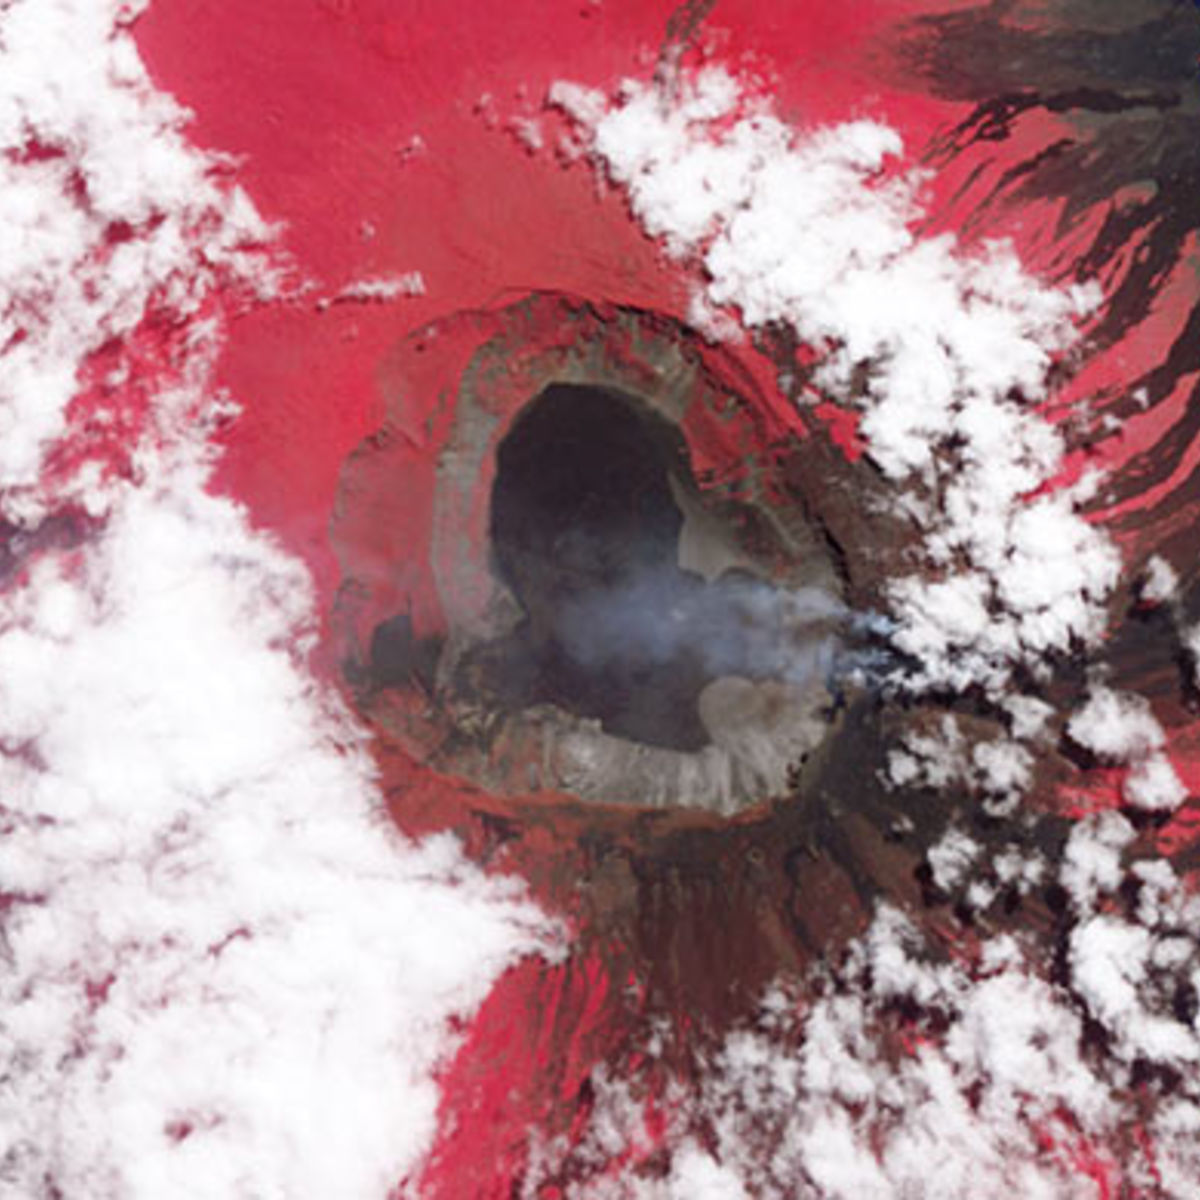 terra_wolf_volcano_ir_590.jpg